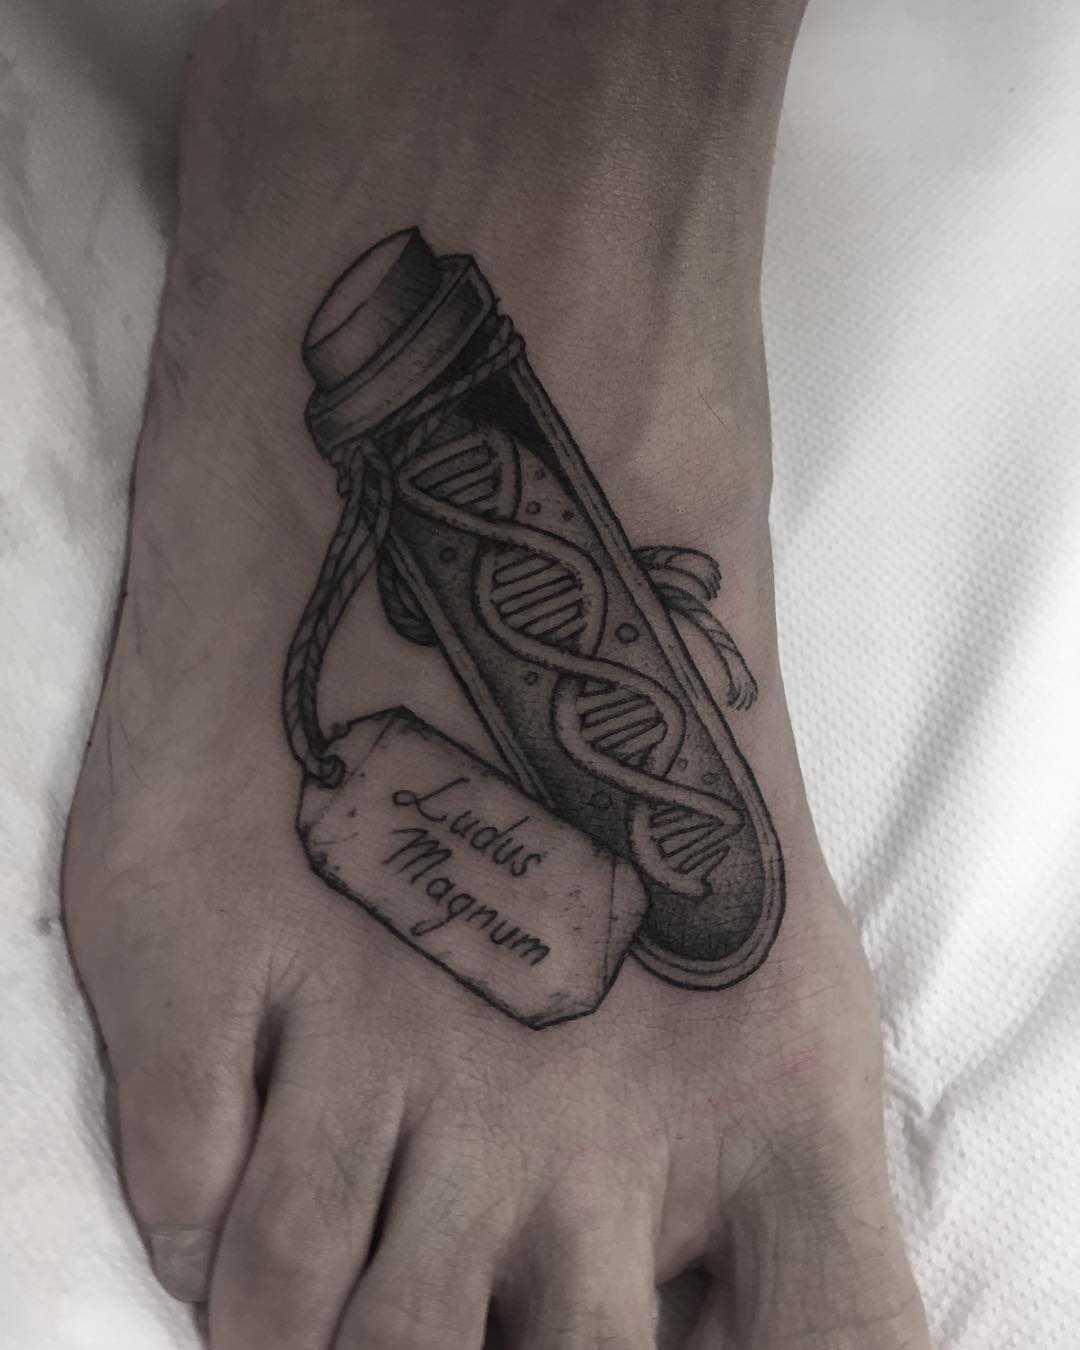 Gladiator DNA tattoo done at Primordial Pain Studio